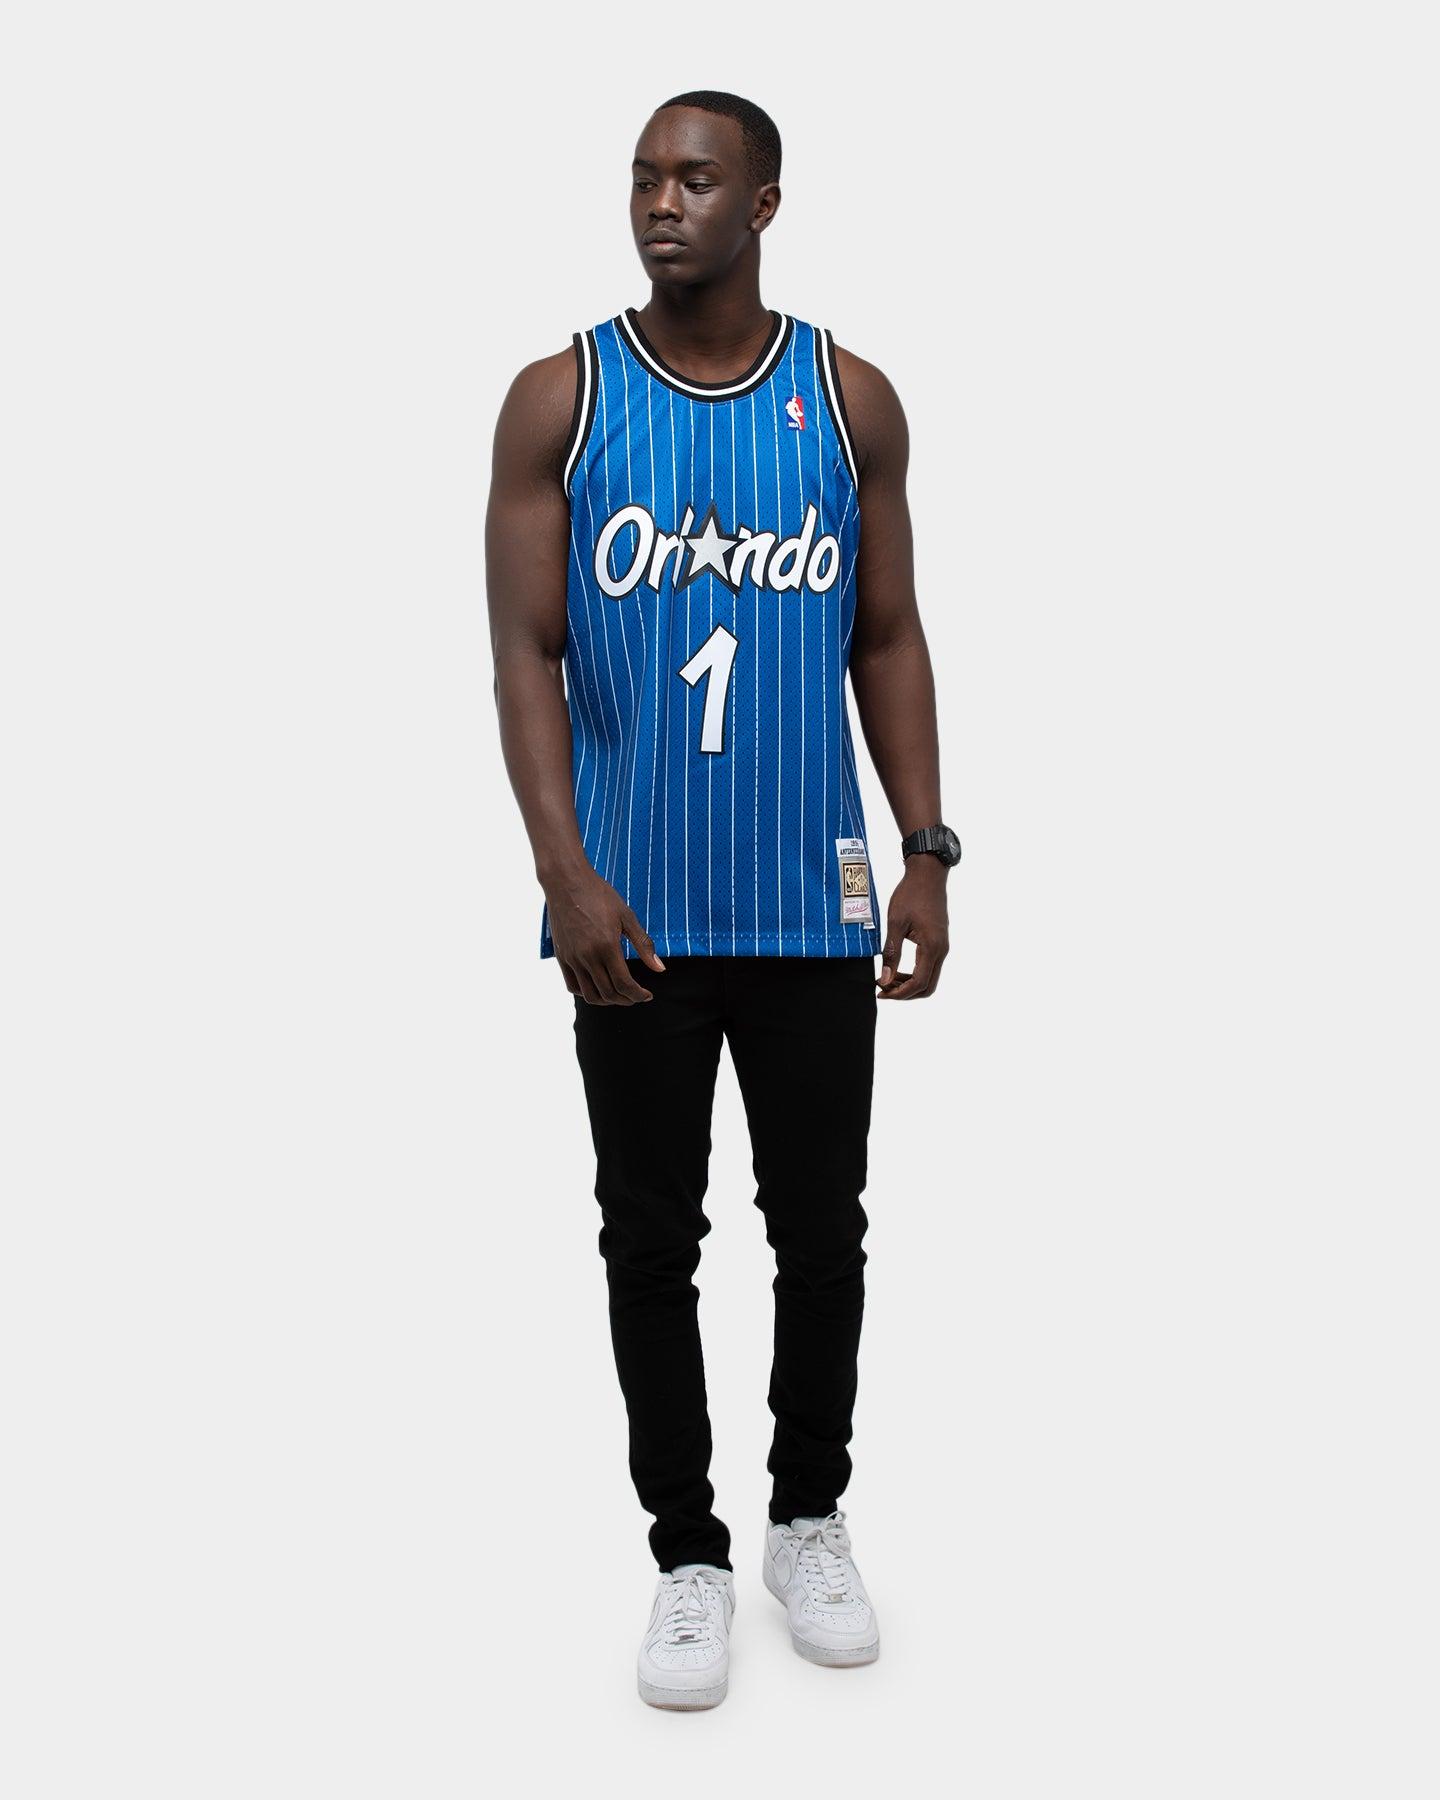 BLUE Mitchell /& Ness Orlando Magic Penny Hardaway #1 NBA Swingman Jersey